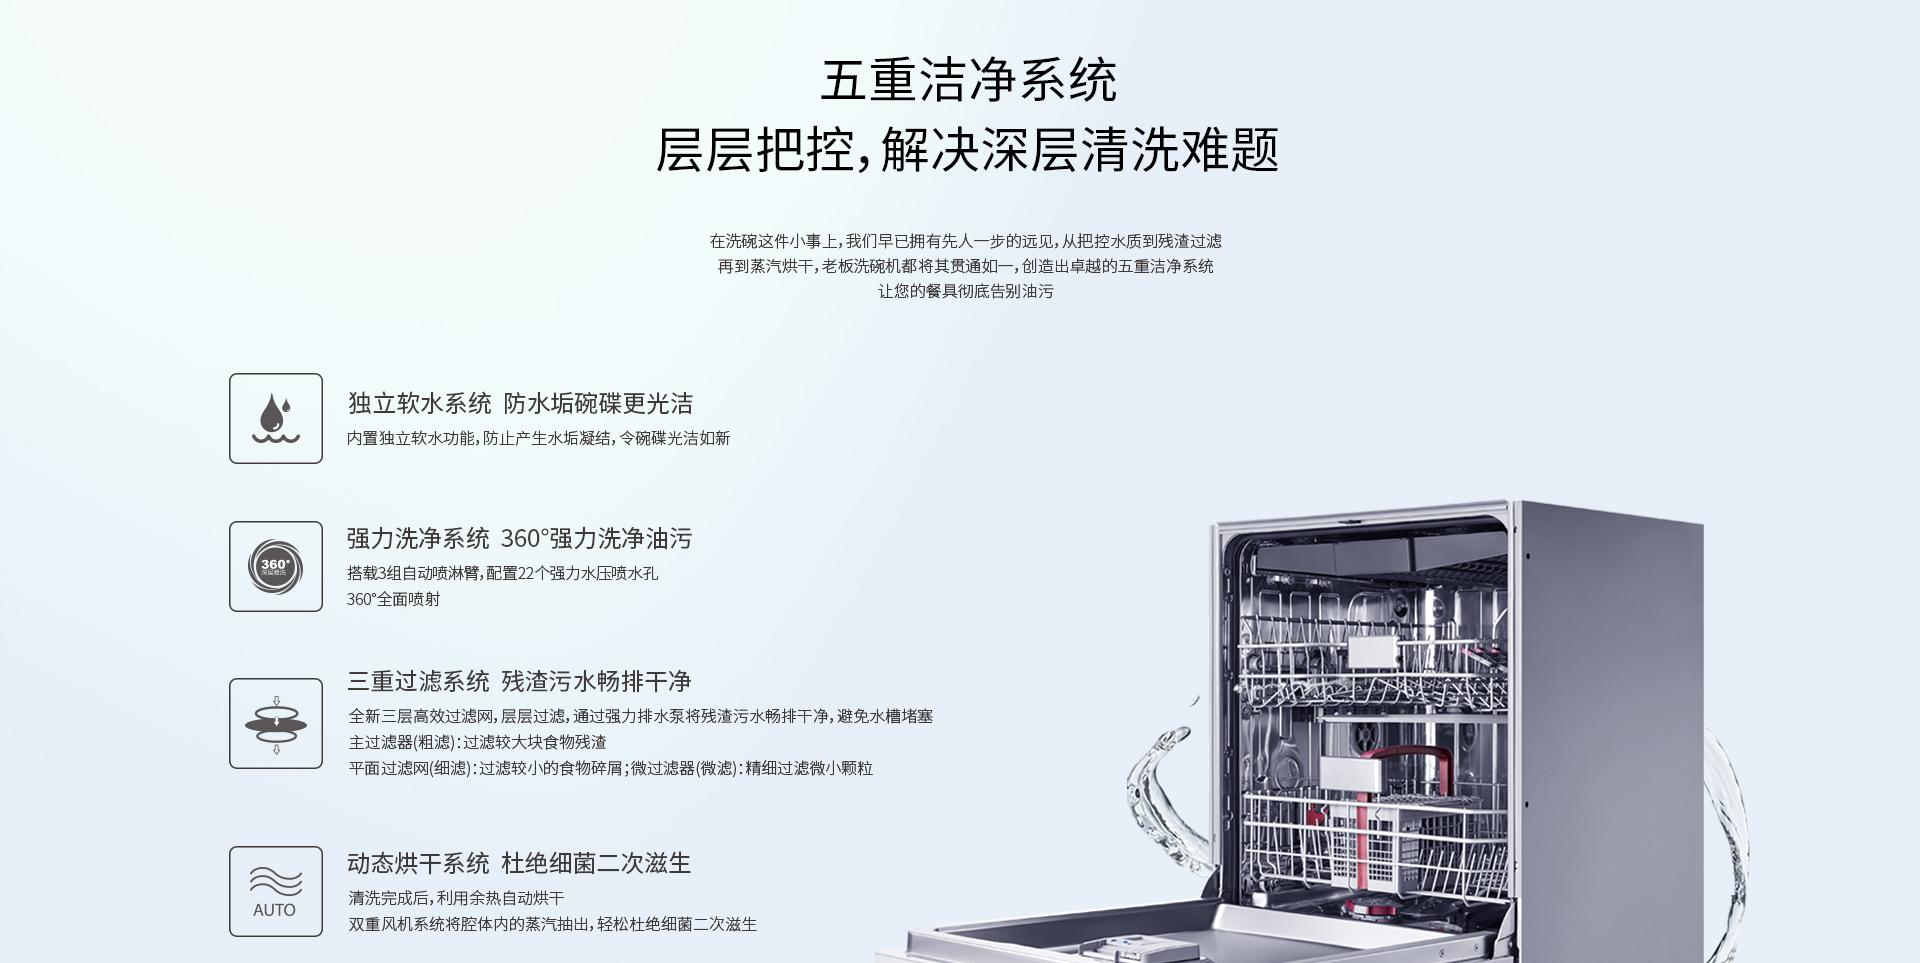 W712网页版_03.jpg